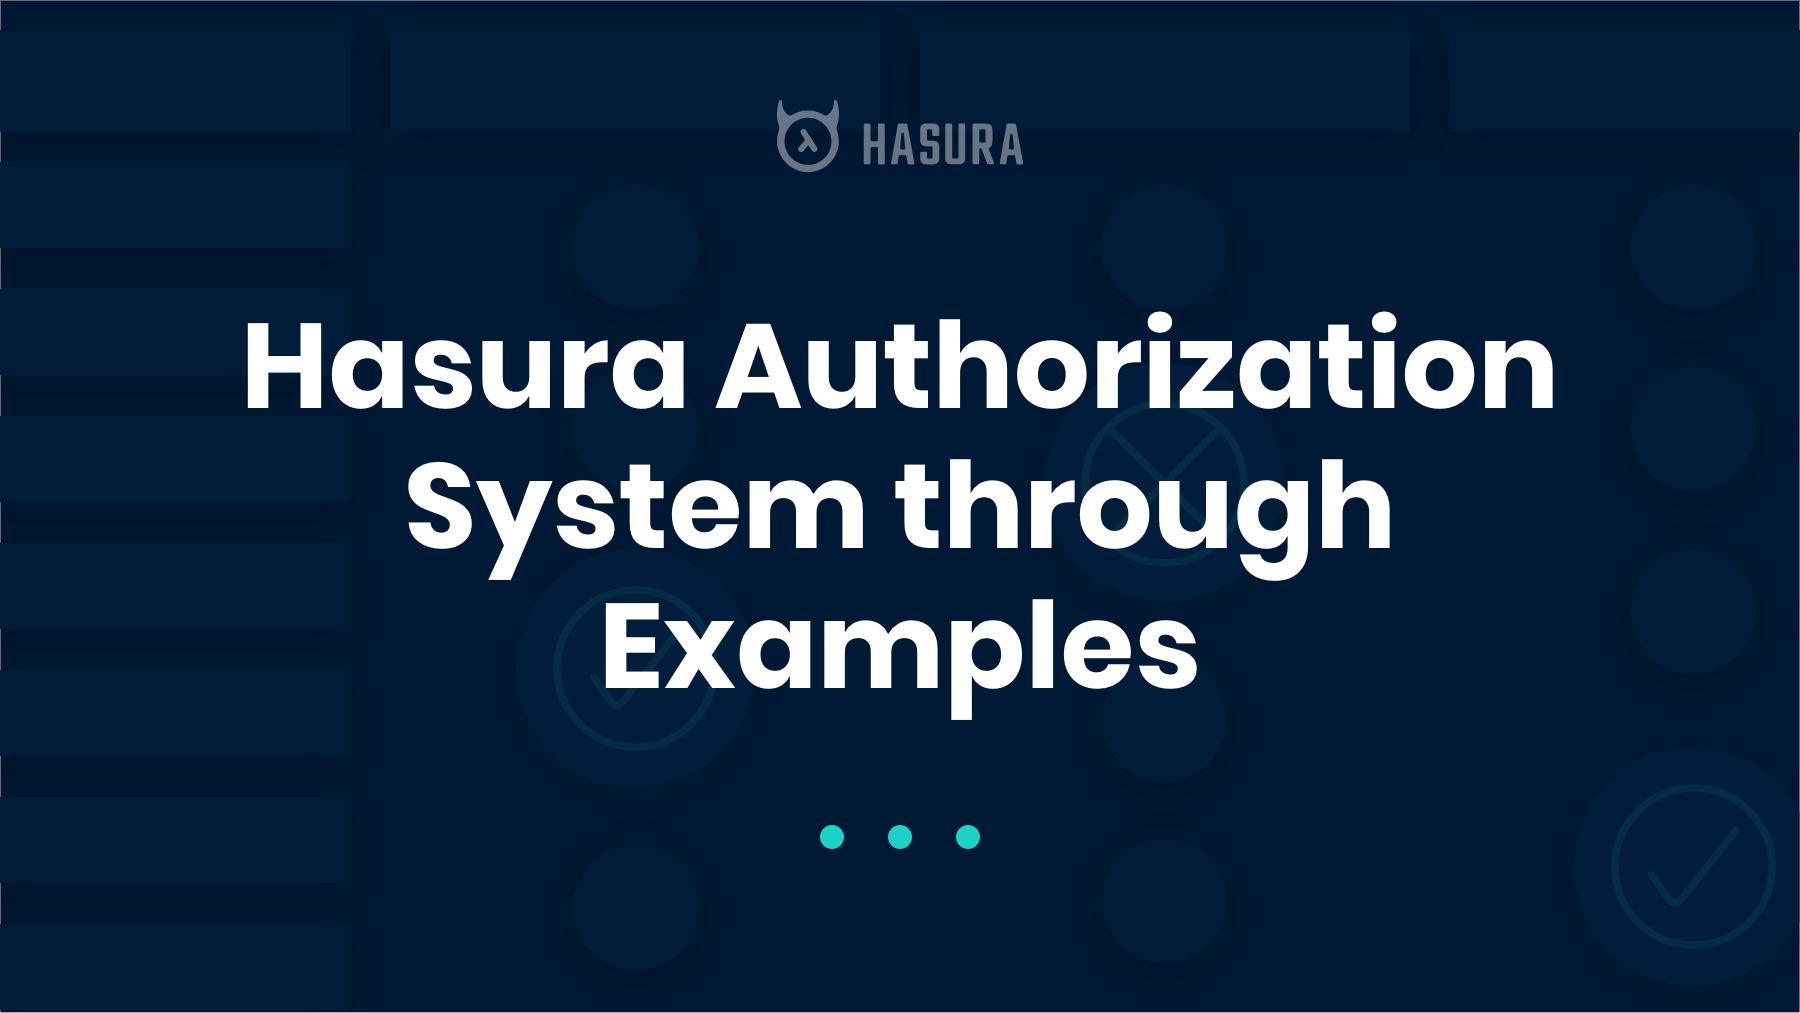 Hasura Authorization System through Examples